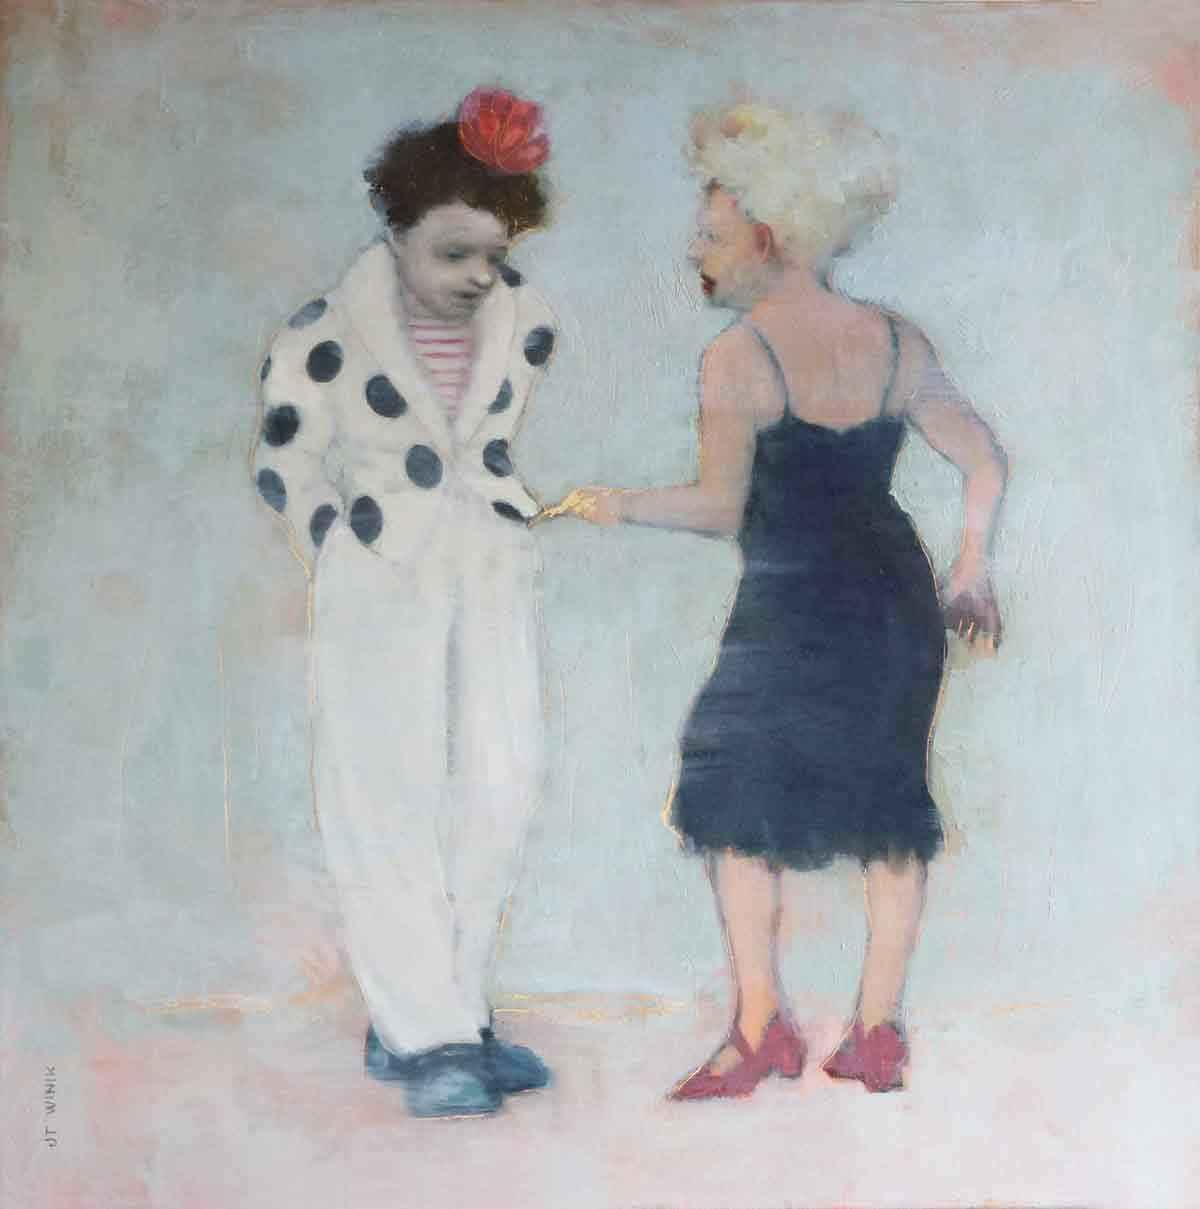 Clown Story I - You!